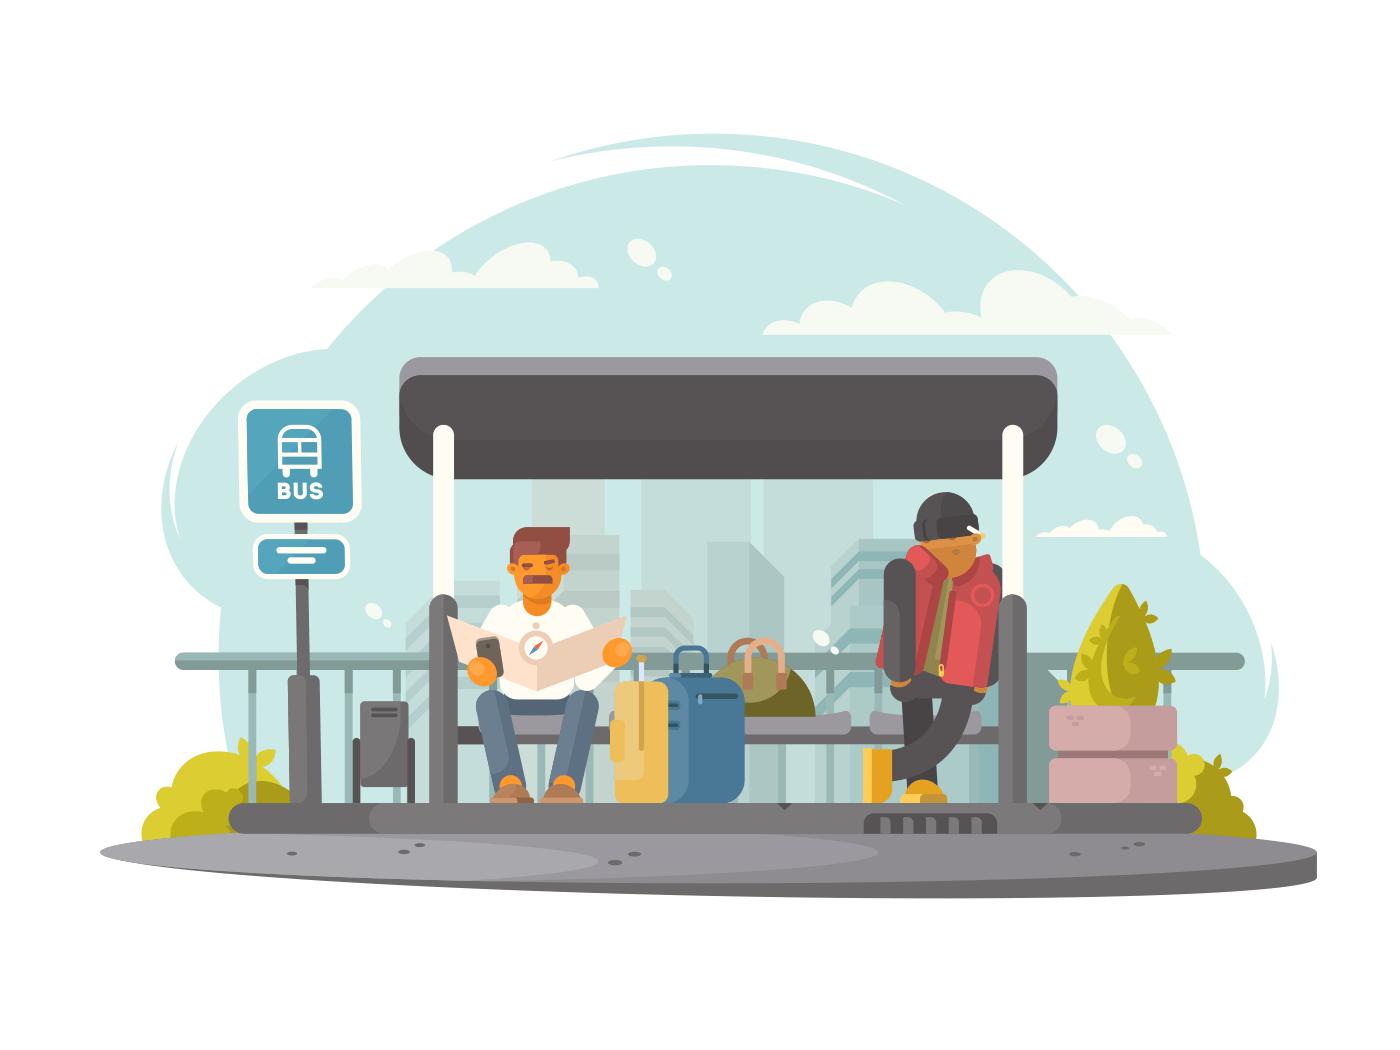 Passengers at bus stop illustration